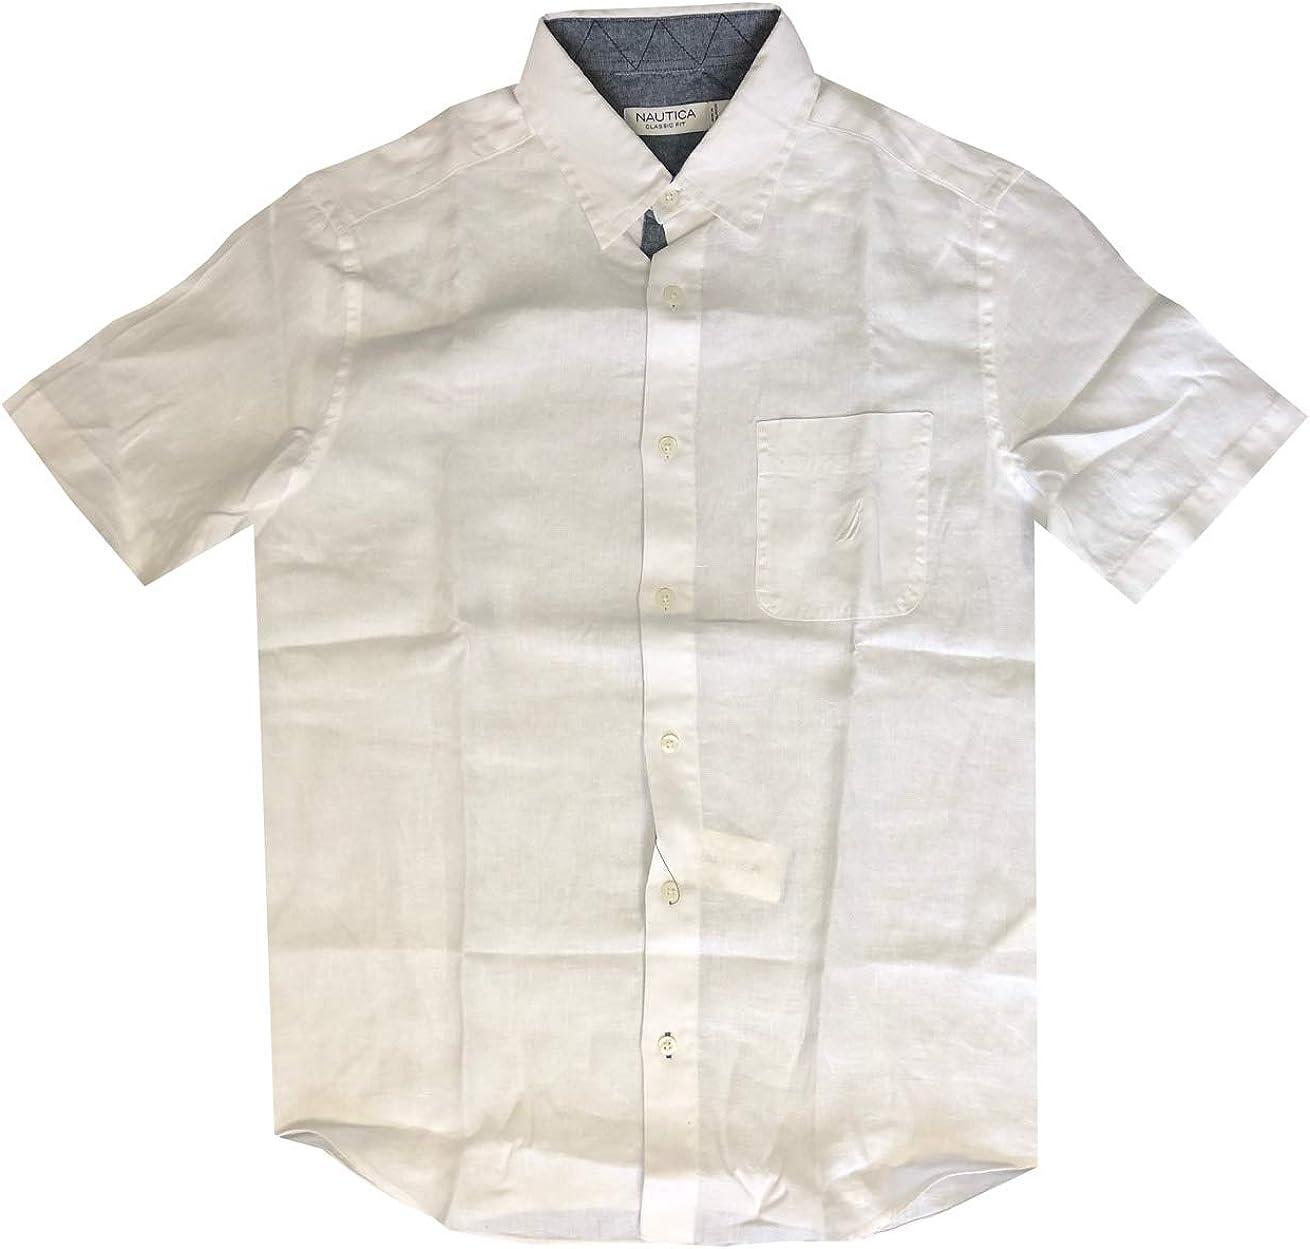 Nautica Mens Classic Fit Short Sleeve Chest Pocket Linen Shirt